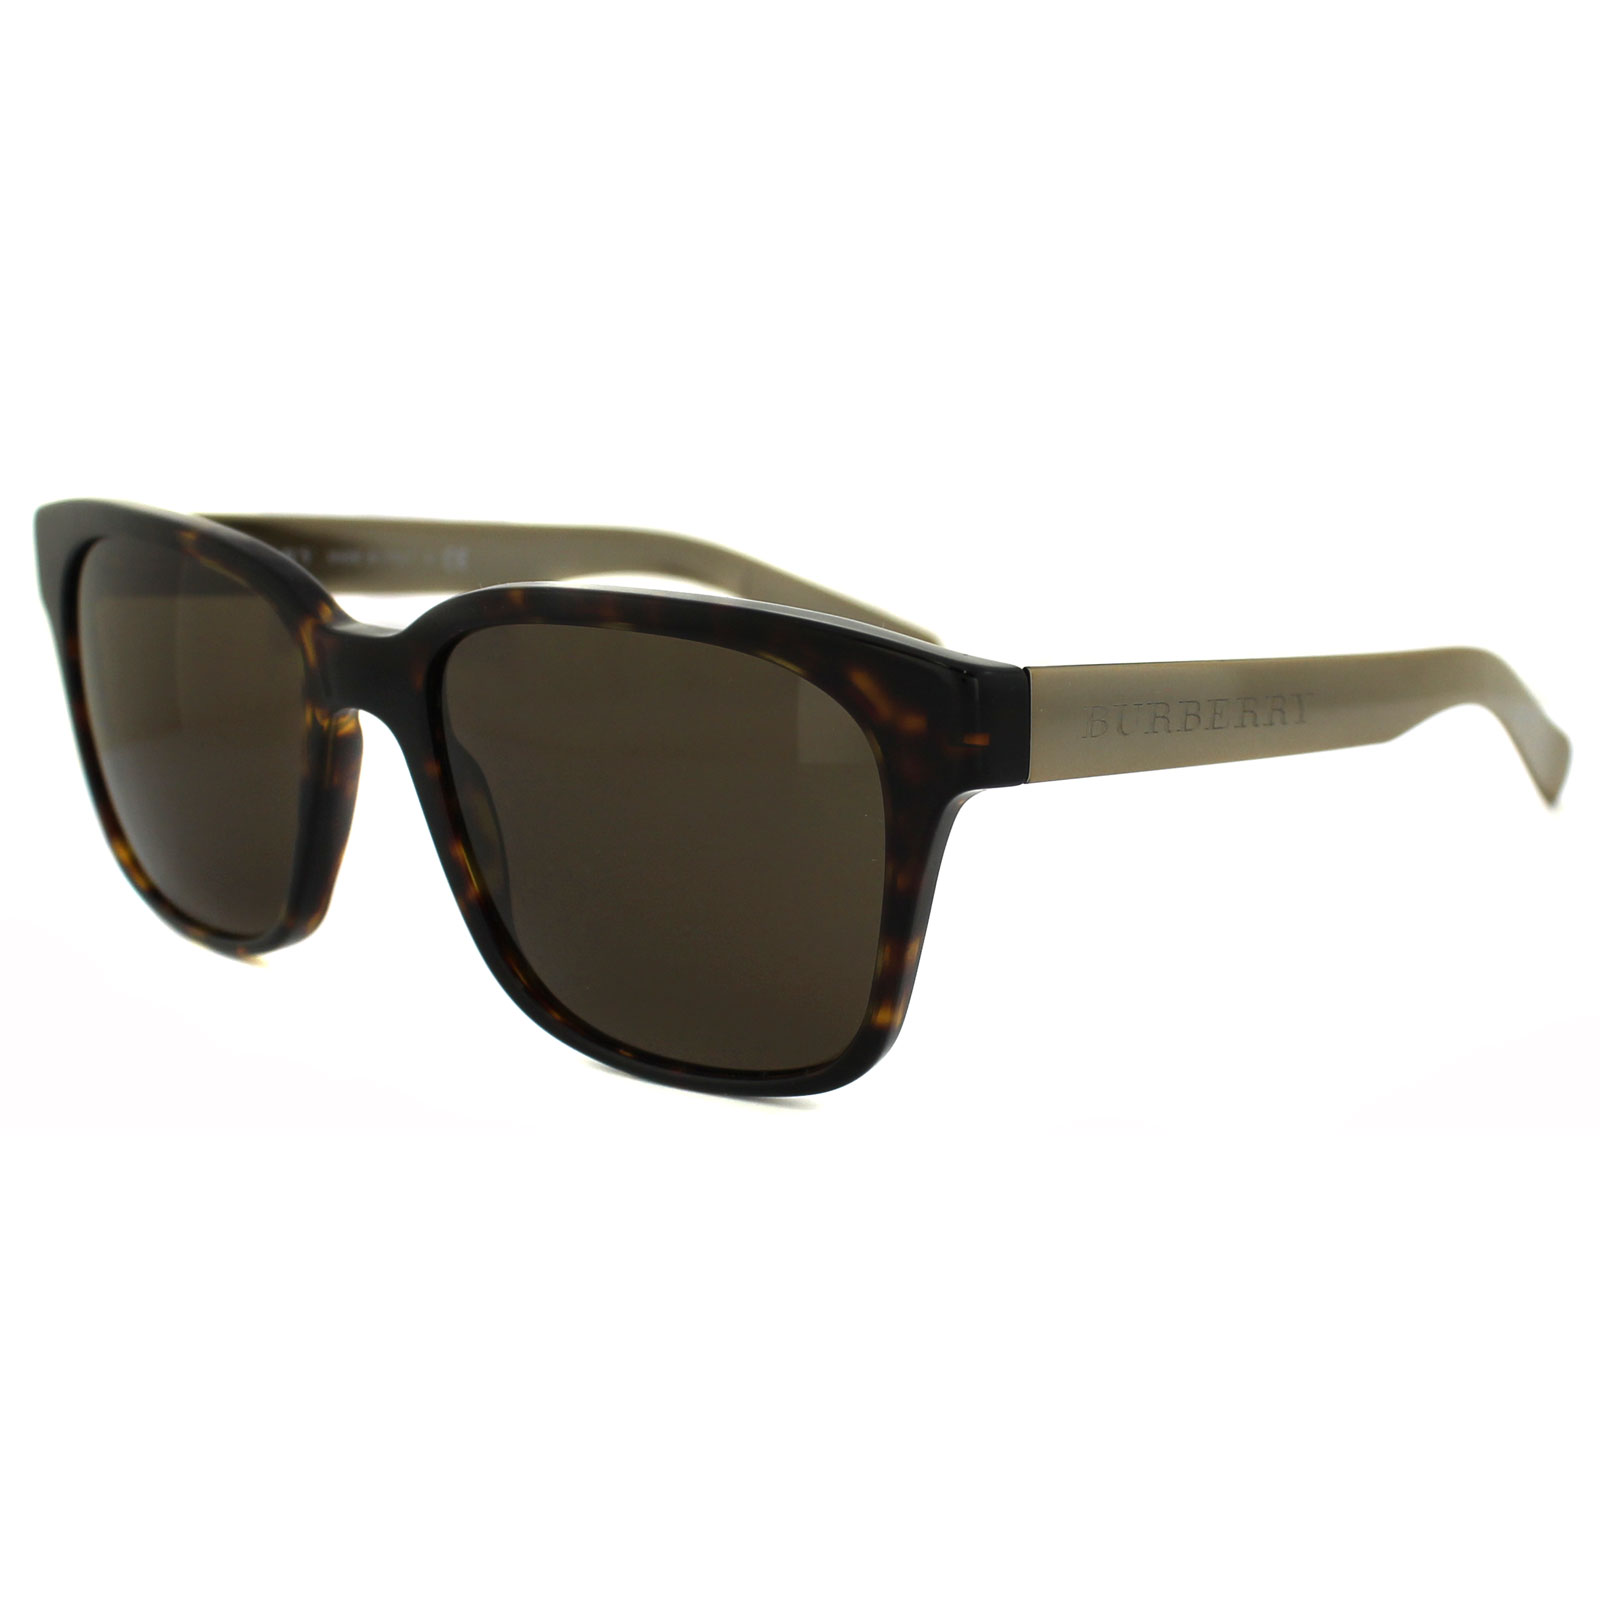 eae3b0d0a98a Burberry Sunglasses 4148 300273 Tortoise Brown